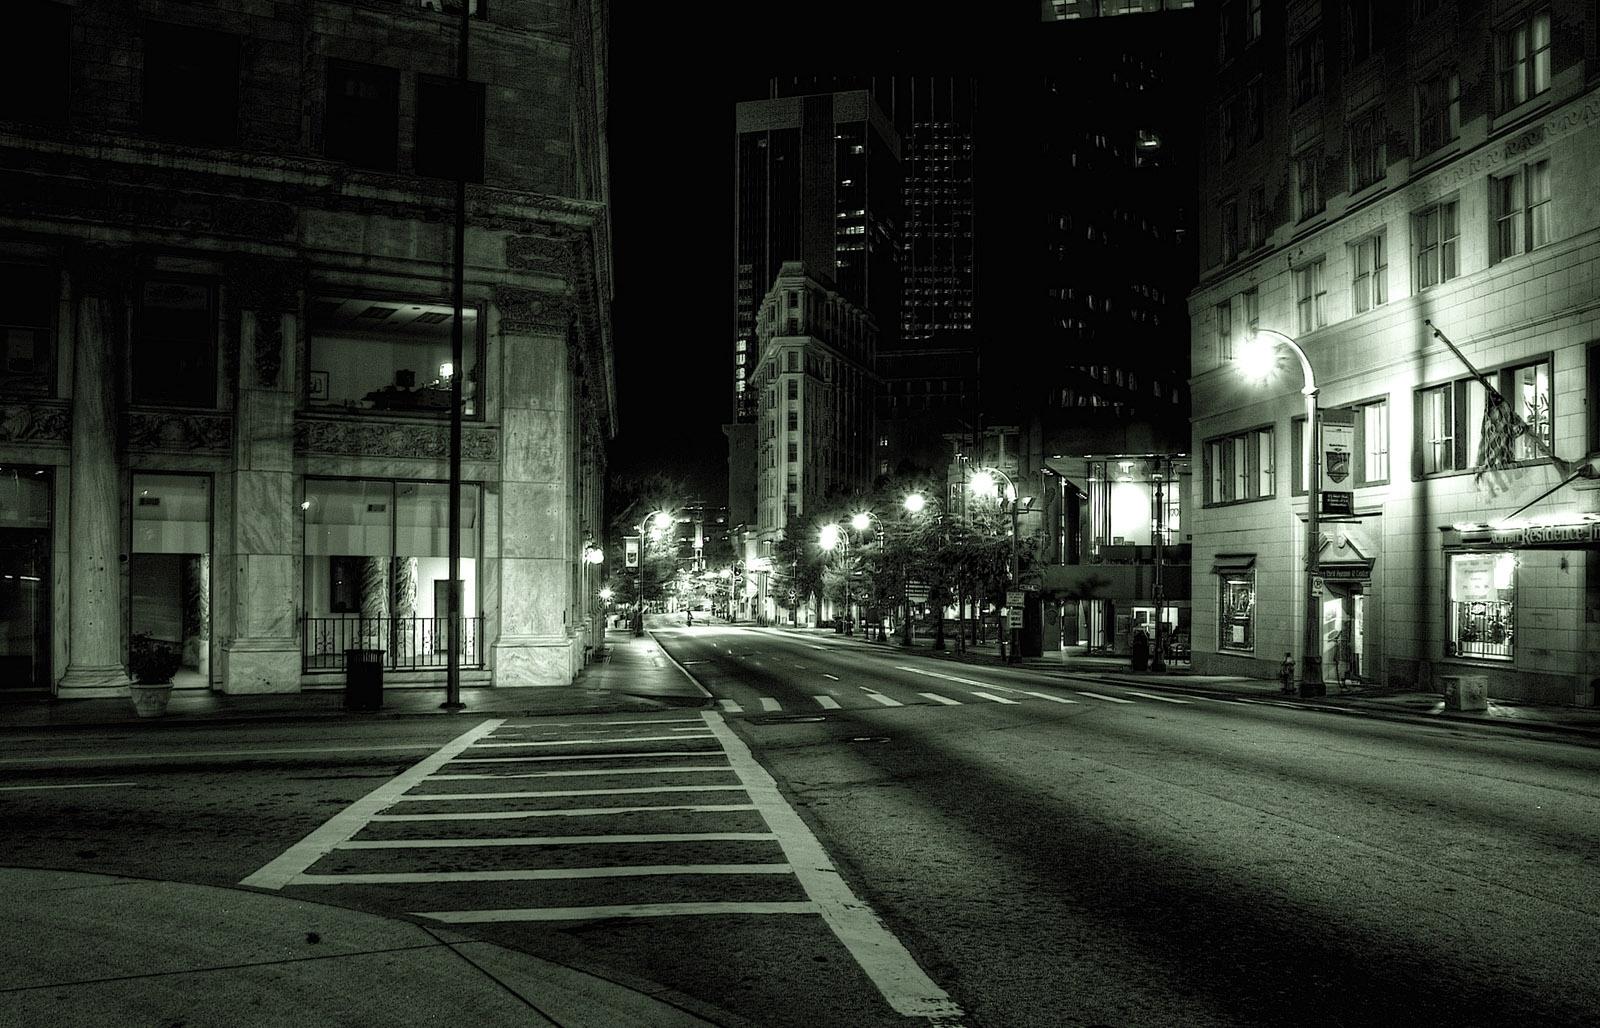 dark city street background 9849 | background check all